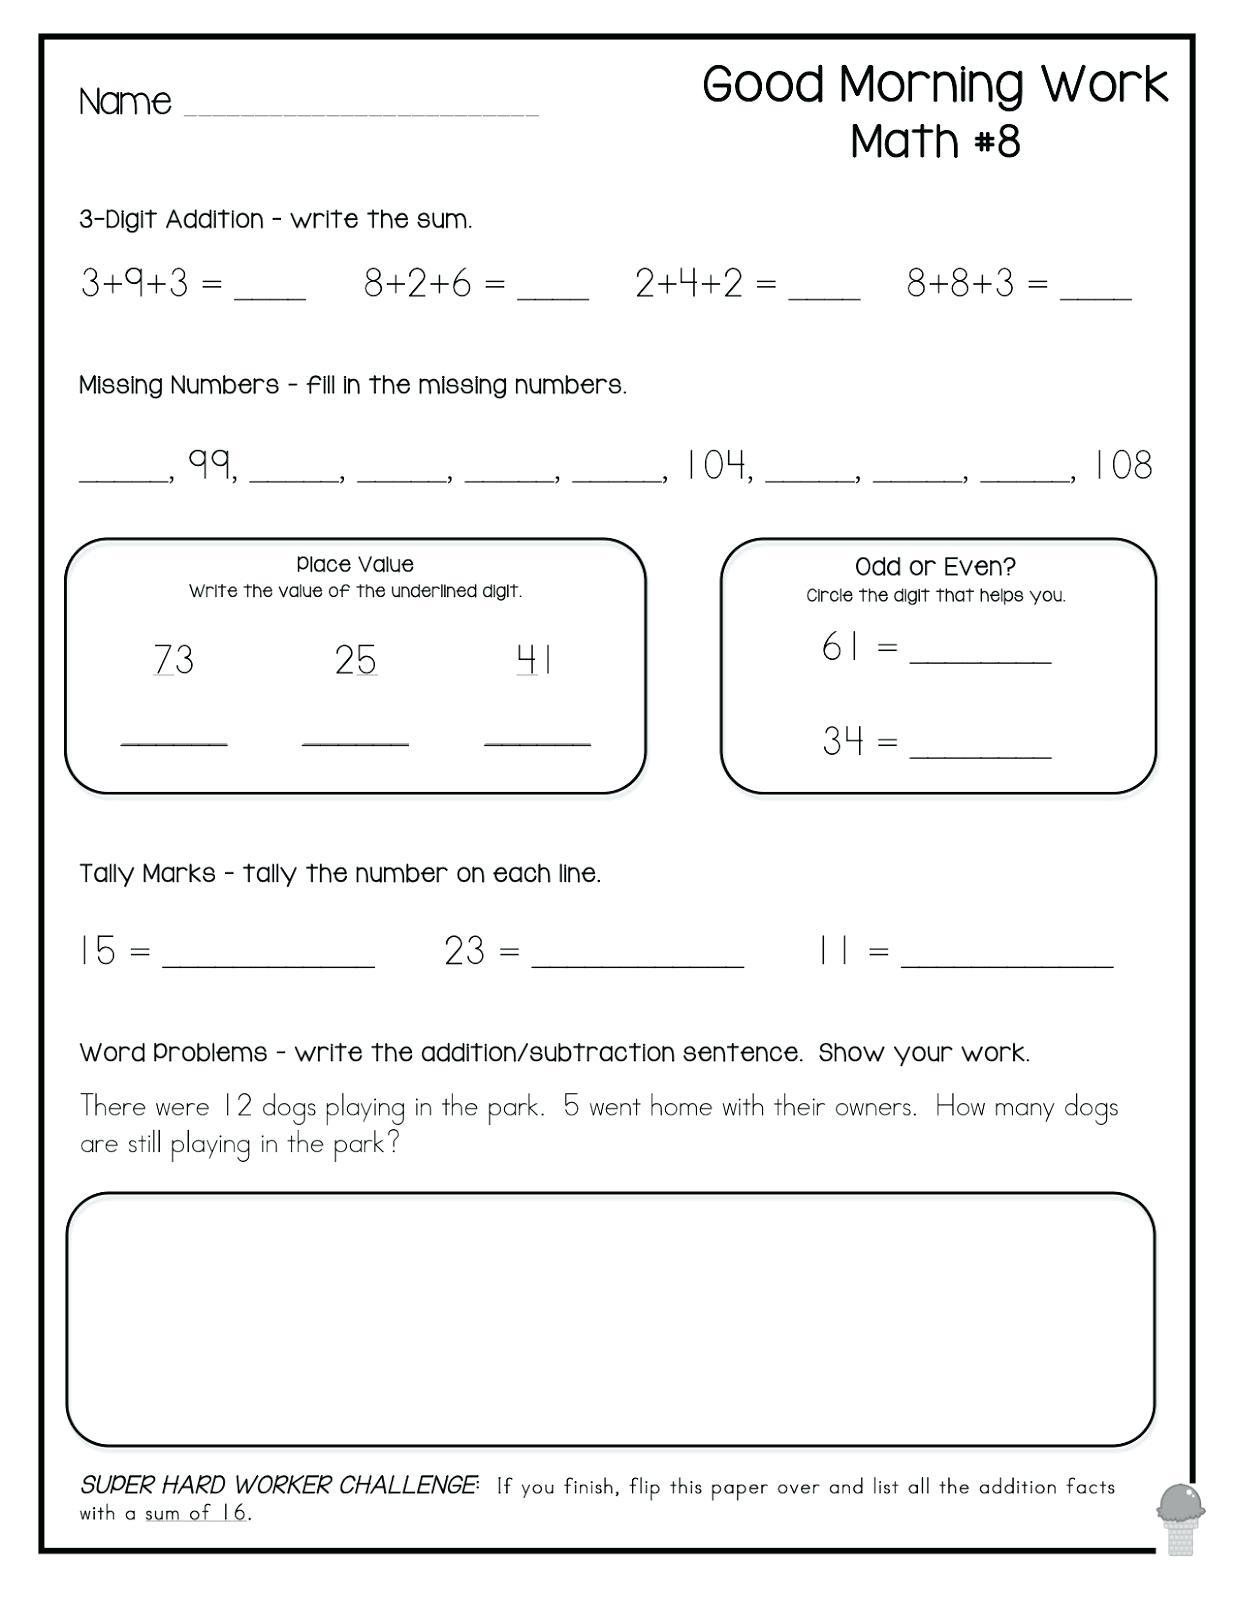 Brain Game Worksheets Printable Brain Game Worksheets – Myheartbeats - Free Printable Brain Teasers Adults